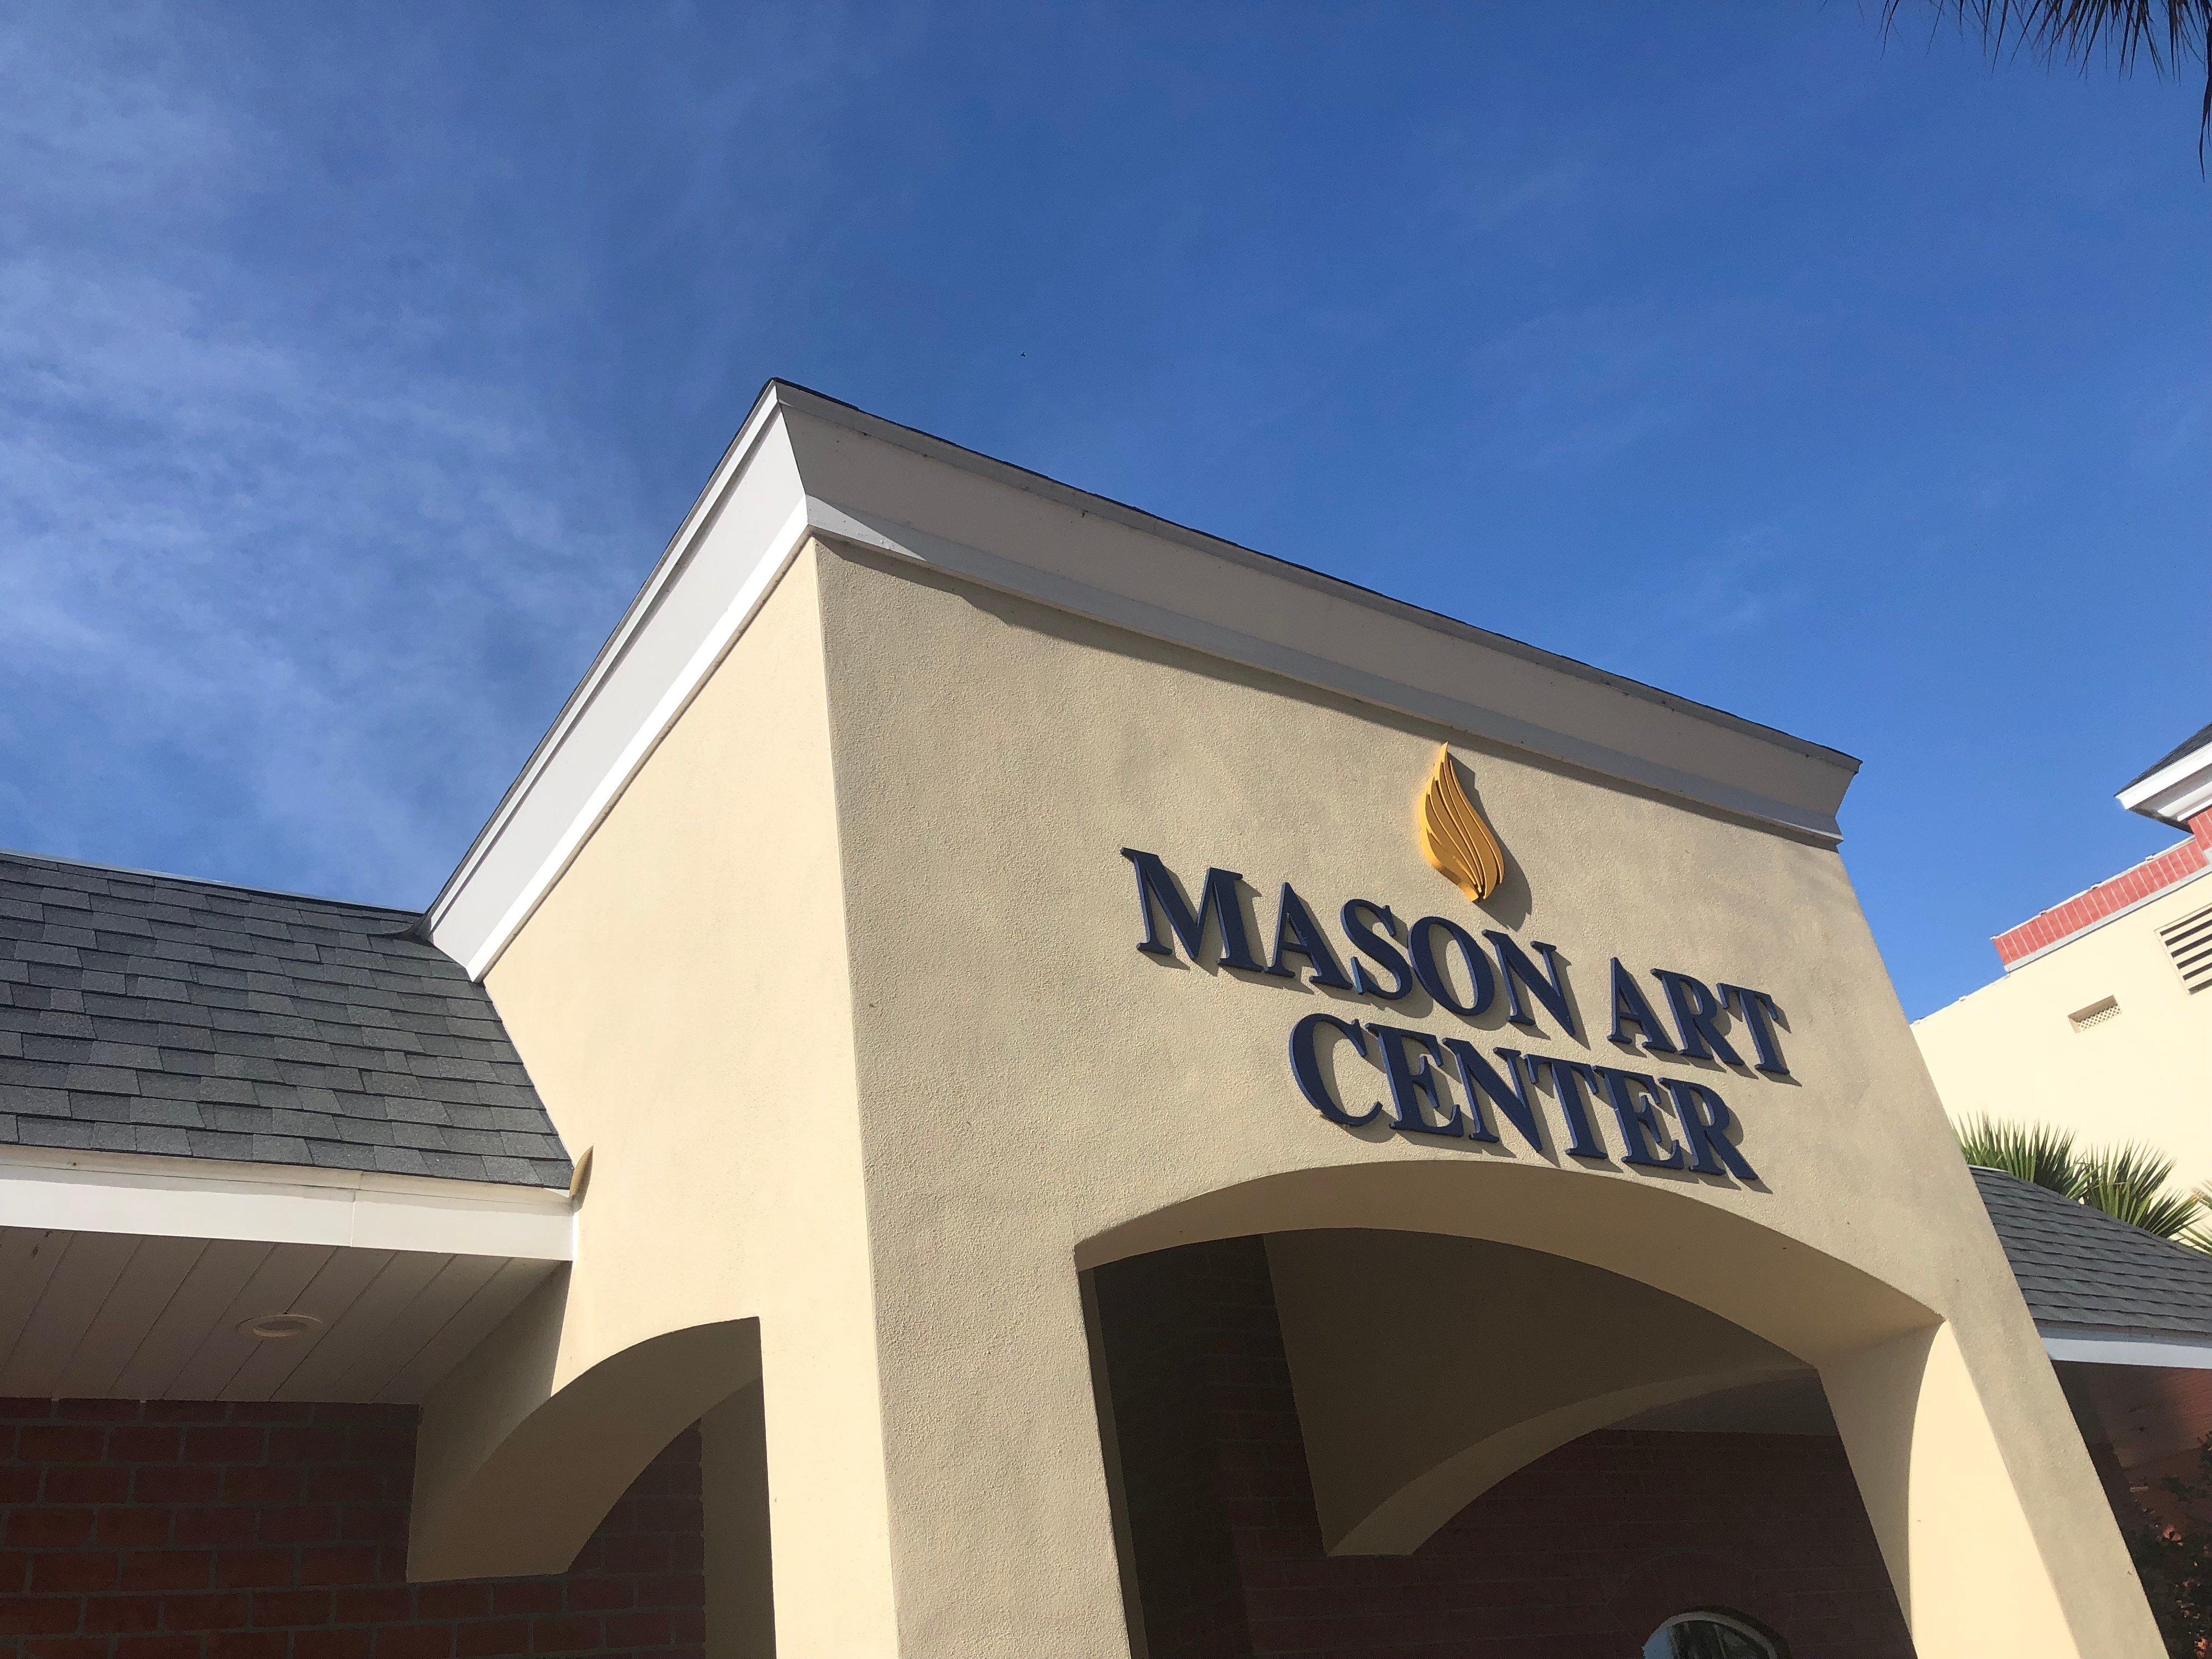 downtown leesburg_beacon college mason art center